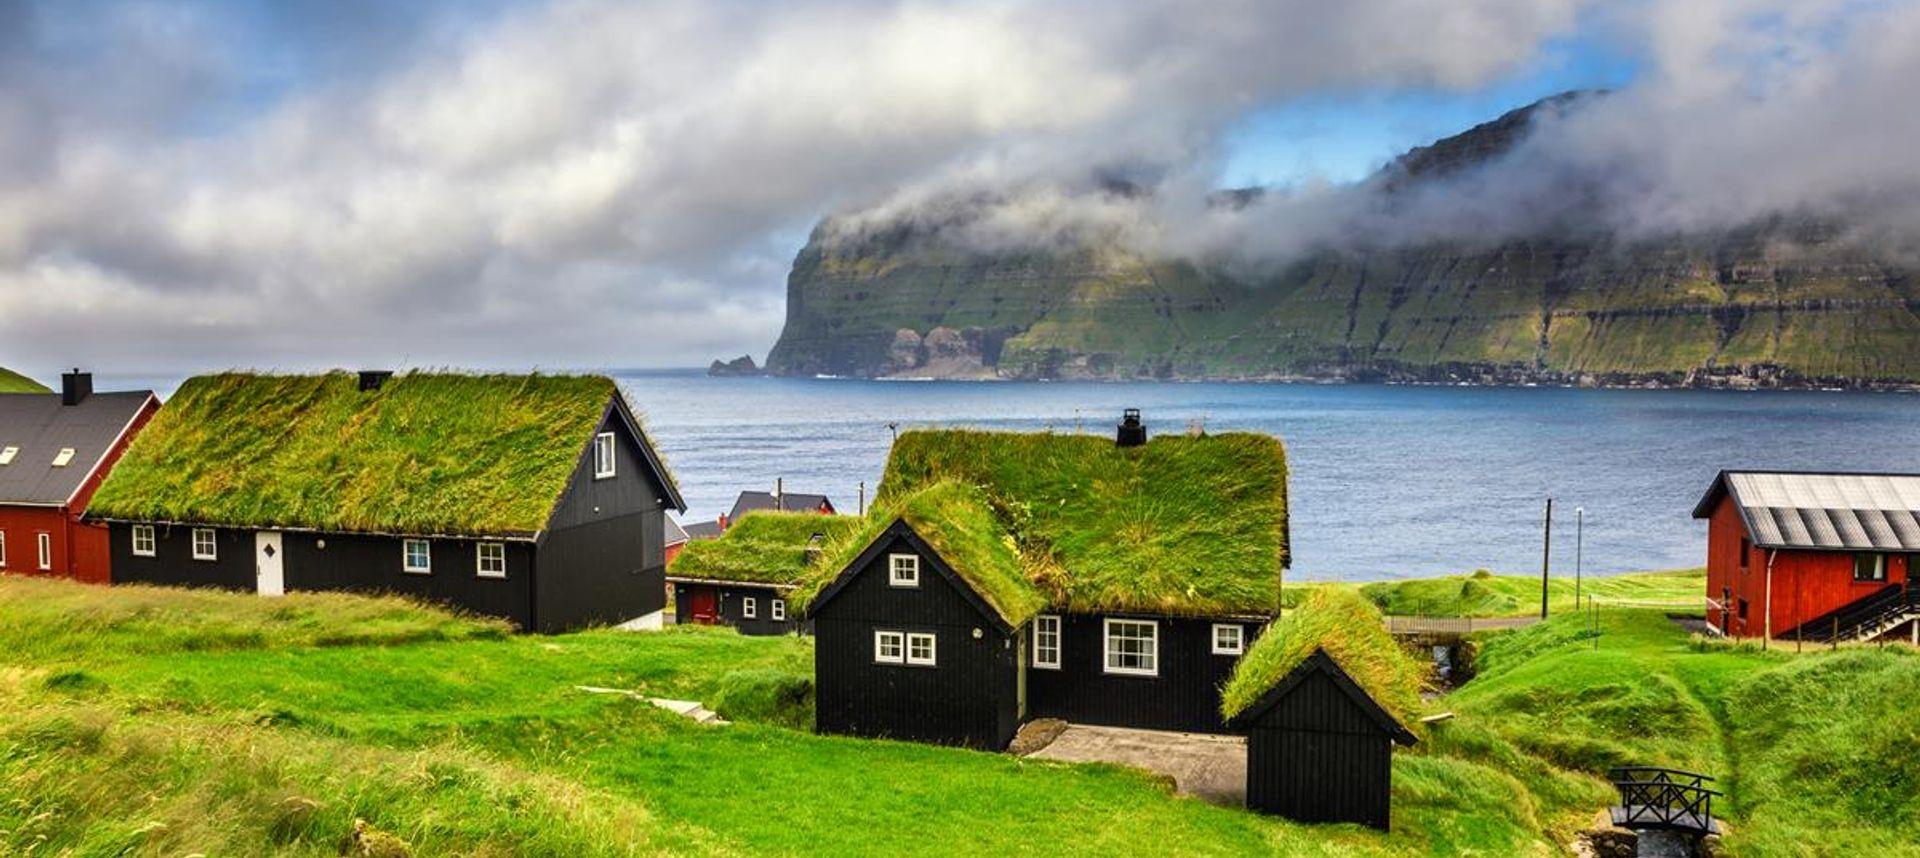 Lighthouse, Torshavn, Faroe Islands (CaptainOates)